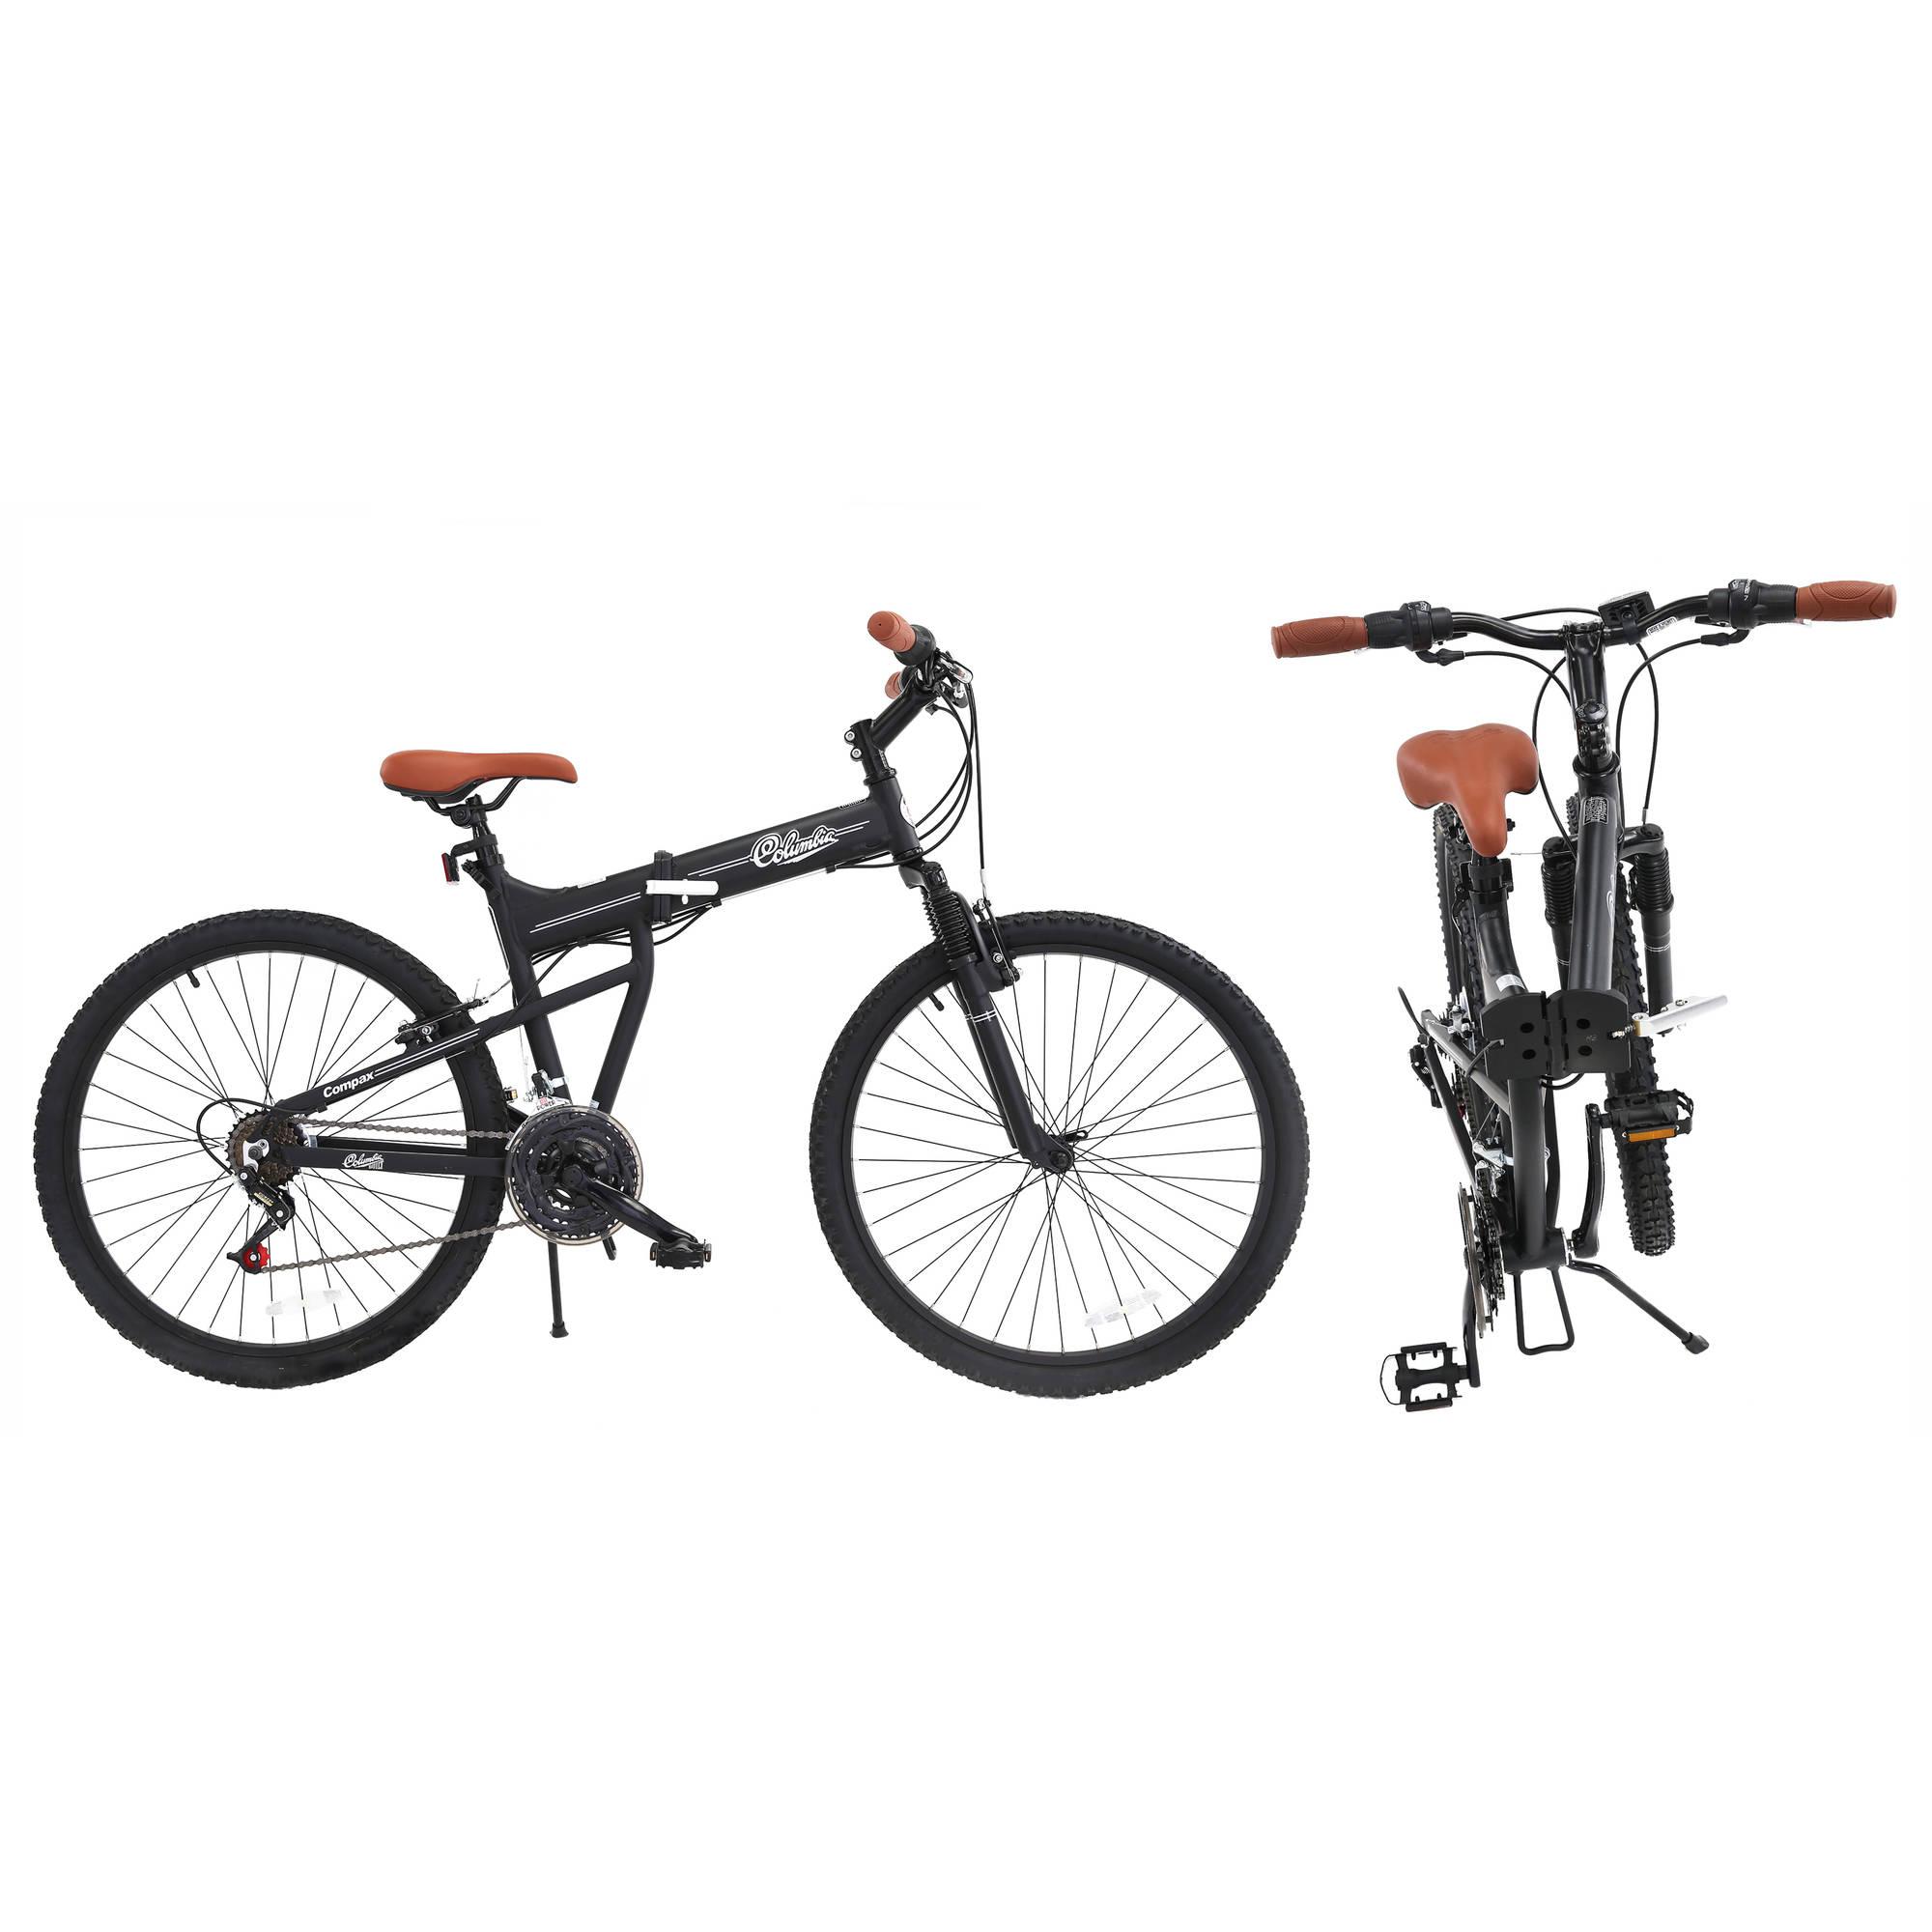 "26"" Columbia Compax Folding Bike"